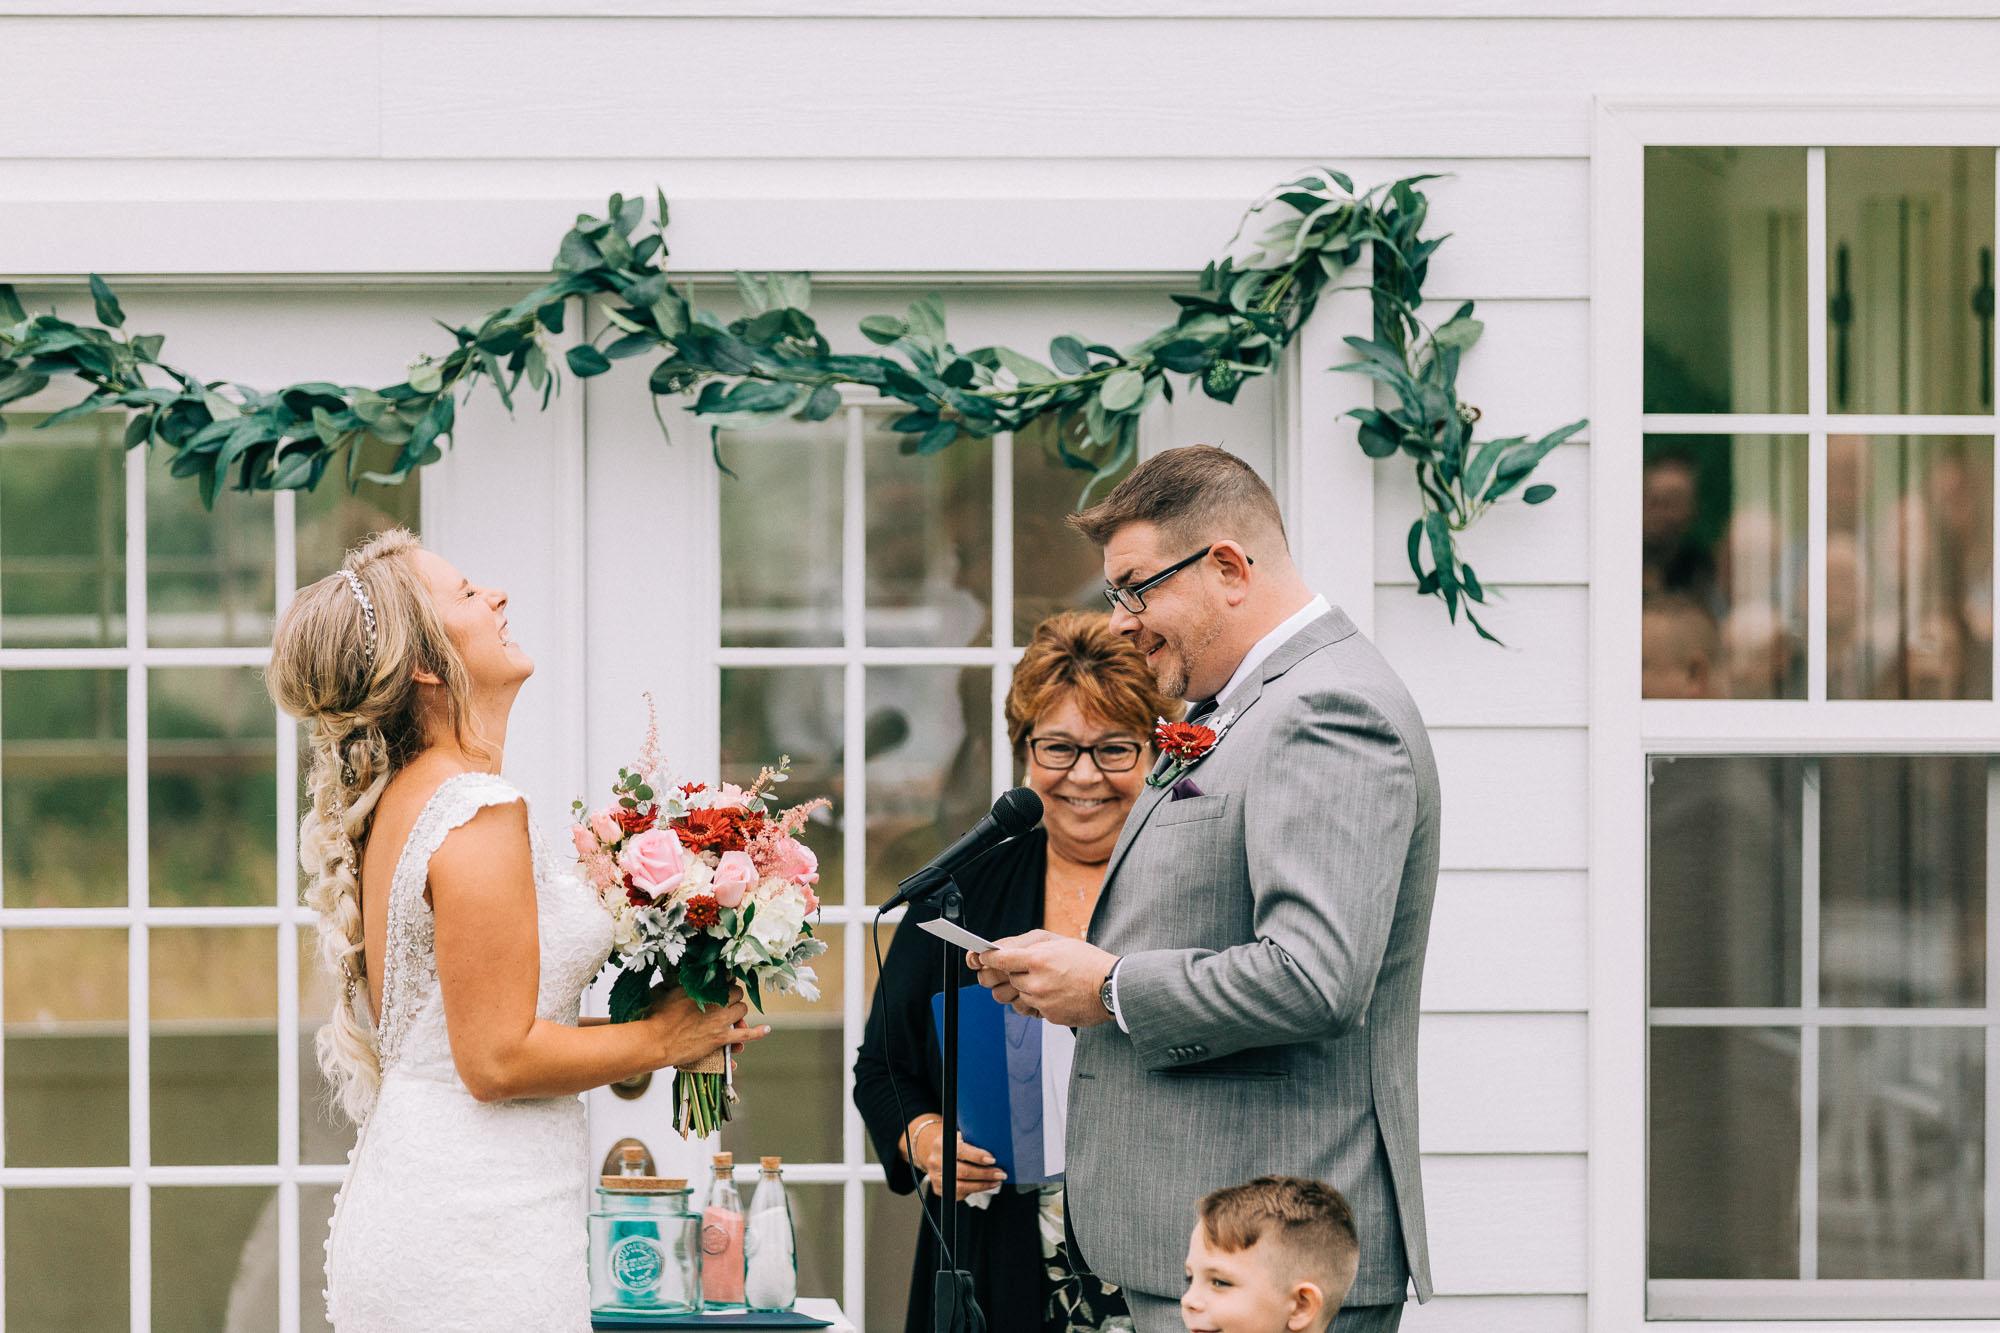 Lodge-at-Raven-Creek-October-wedding-28.jpg